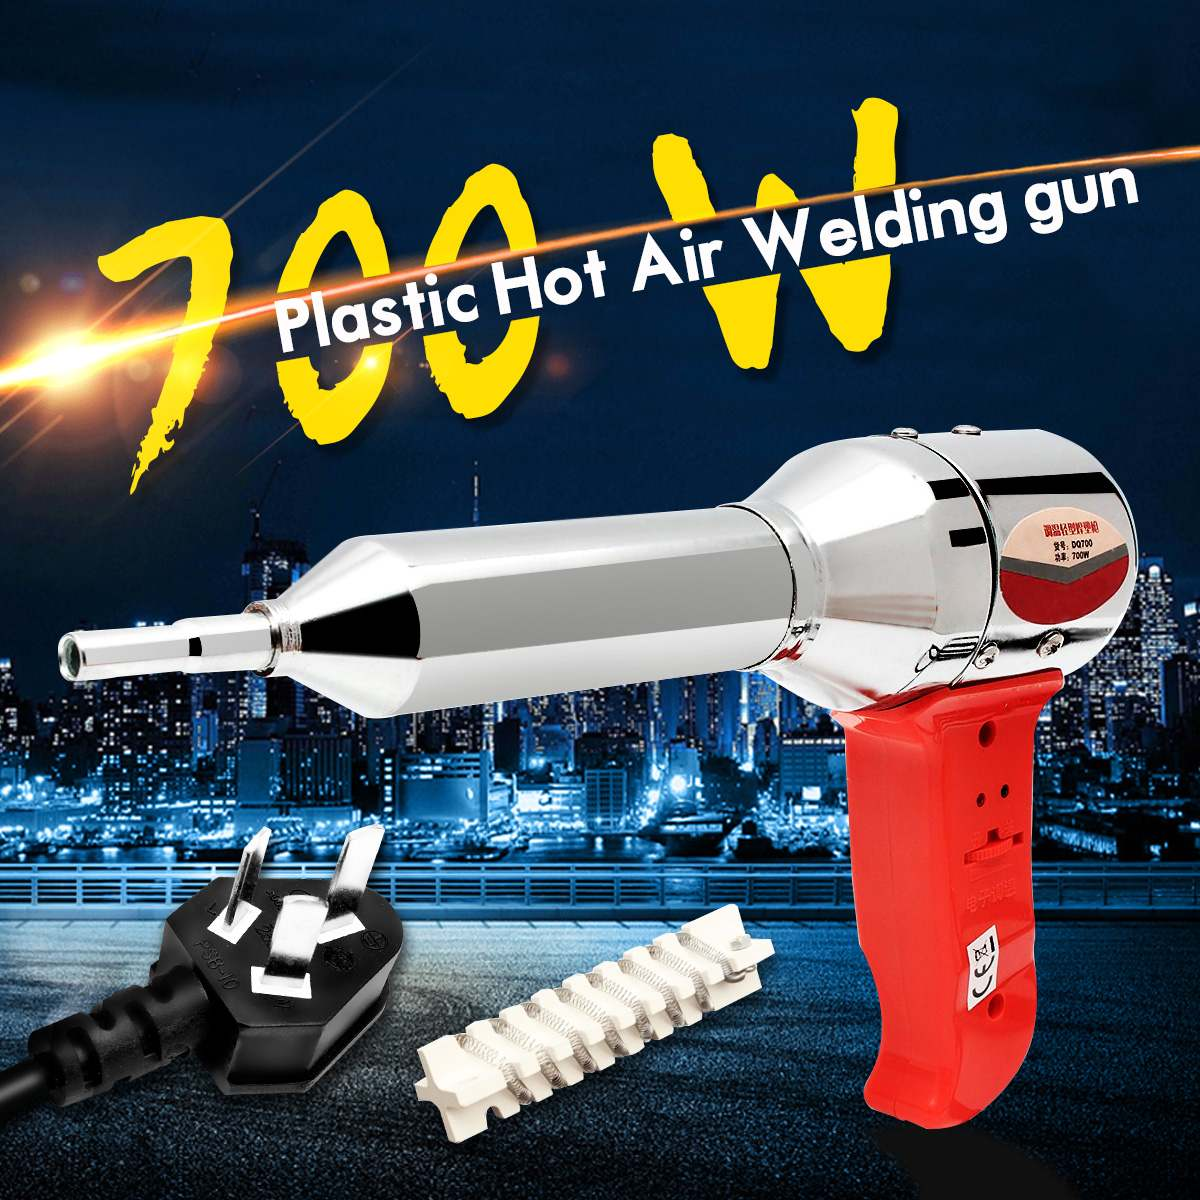 Pistola de soldar caliente portátil de 700W AC 220-240V pistola de soldar de aire caliente eléctrica herramienta de soldadura de calor rápido 100-450 grados + calentador de cerámica